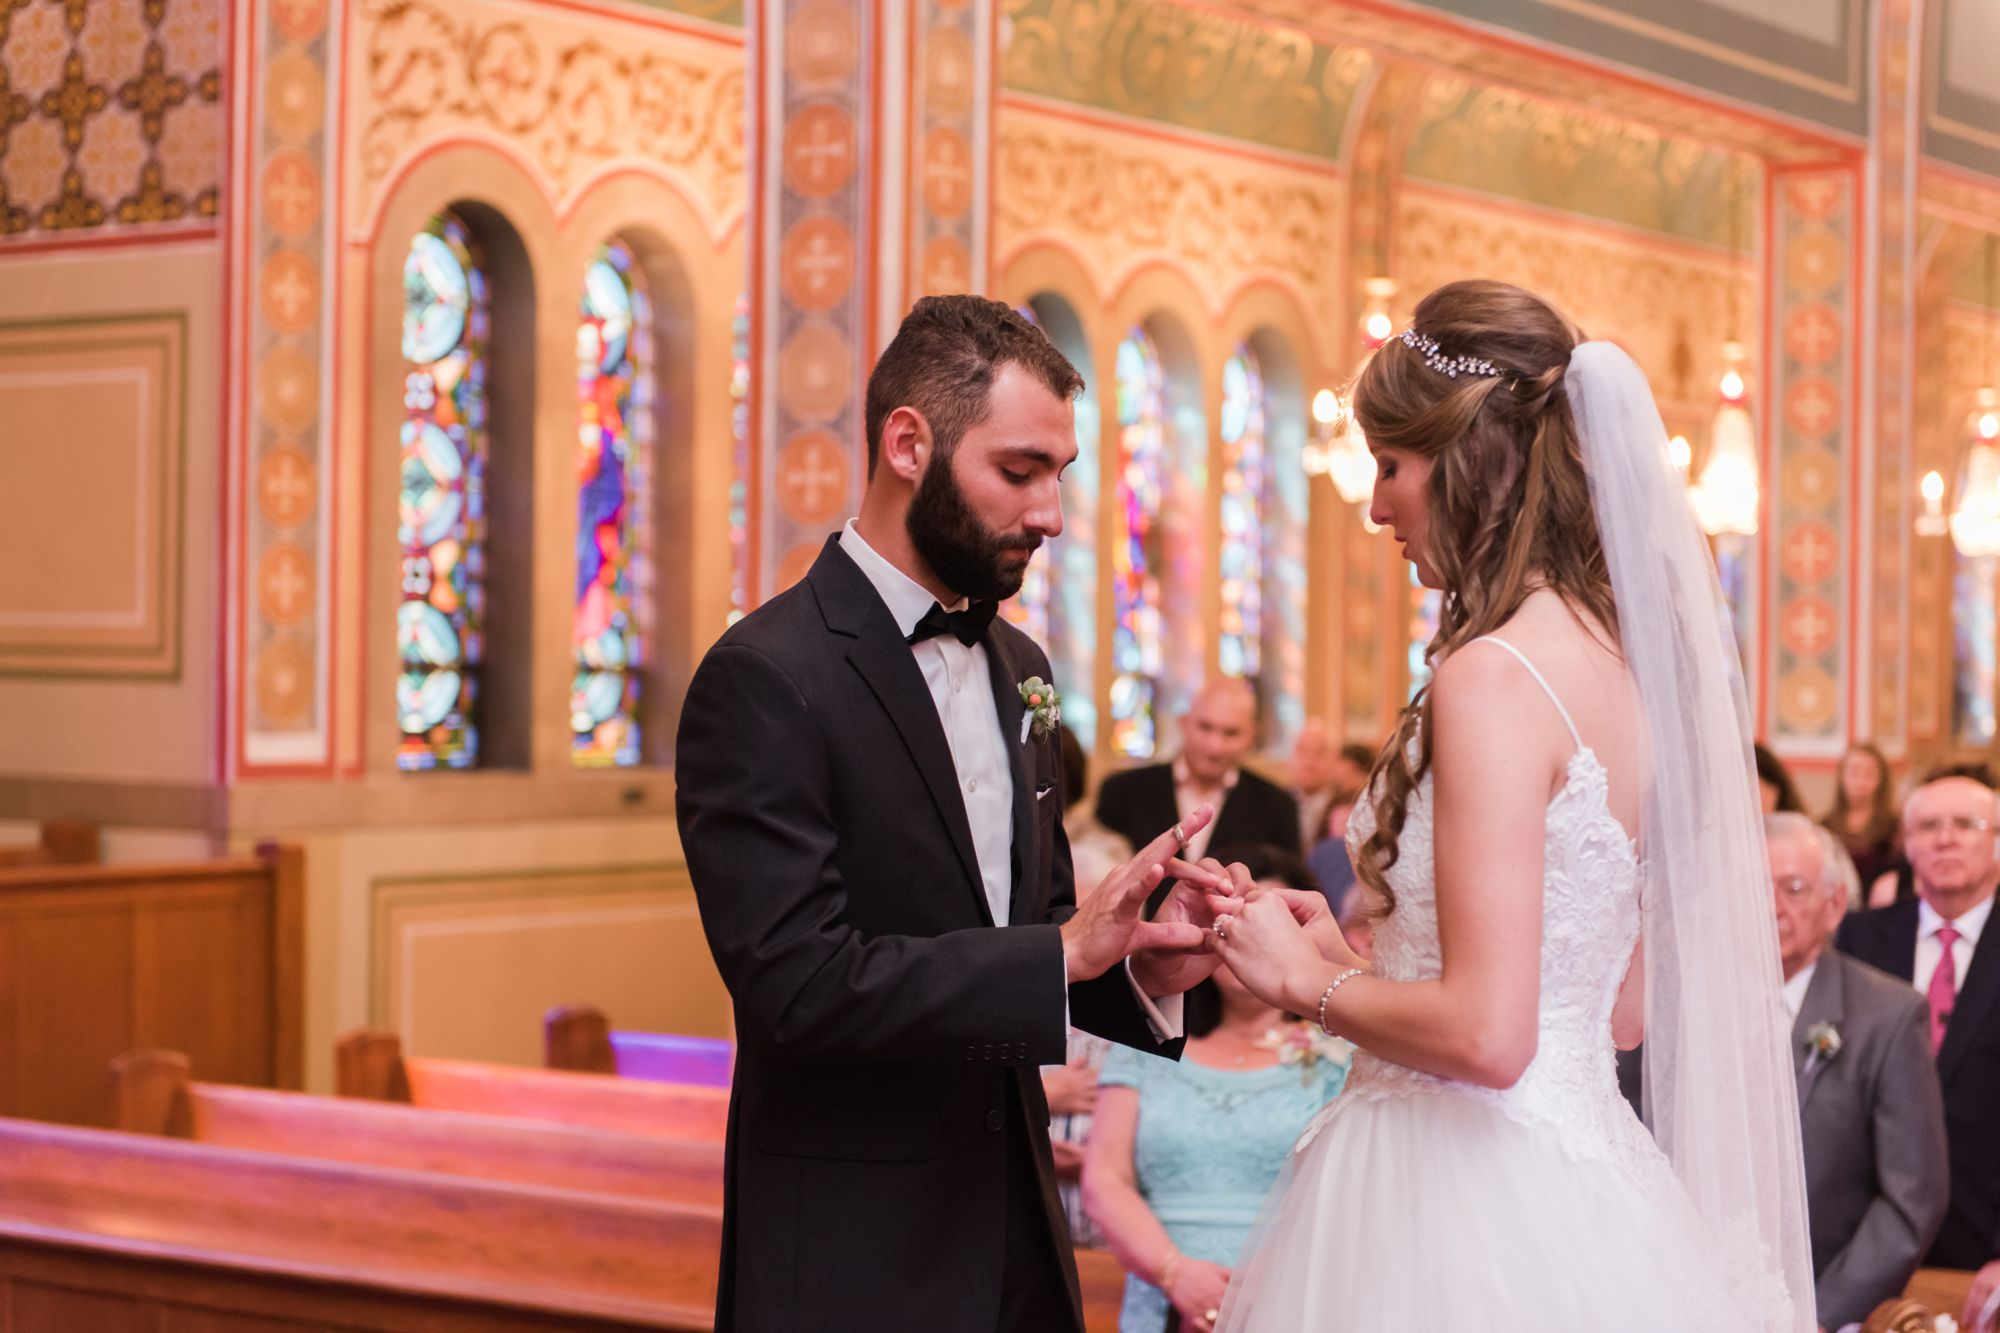 uptown-charlotte-orthodox-greek-wedding 60